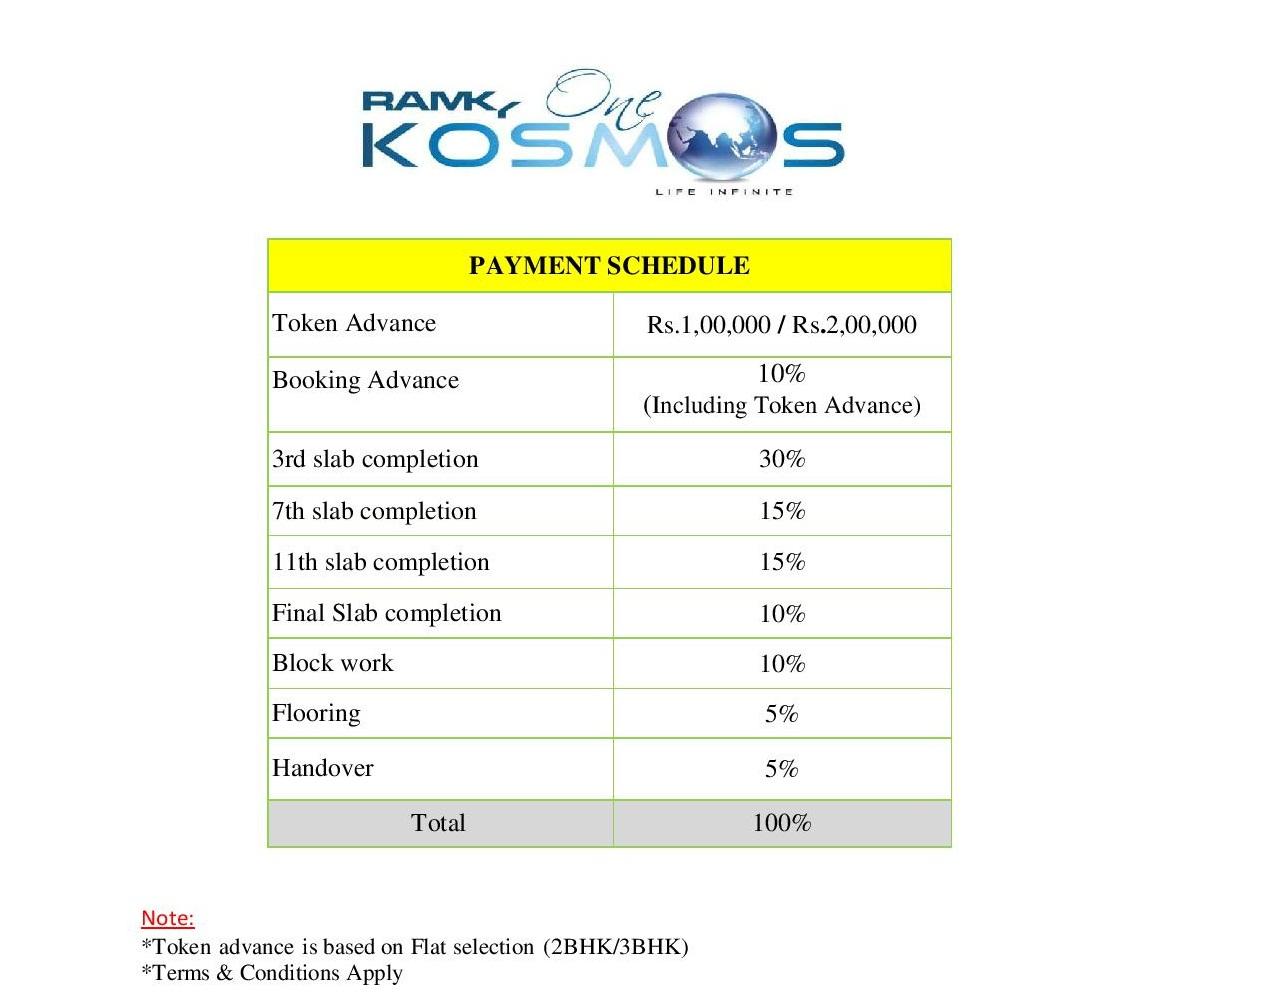 ramky one kosmos payment plan